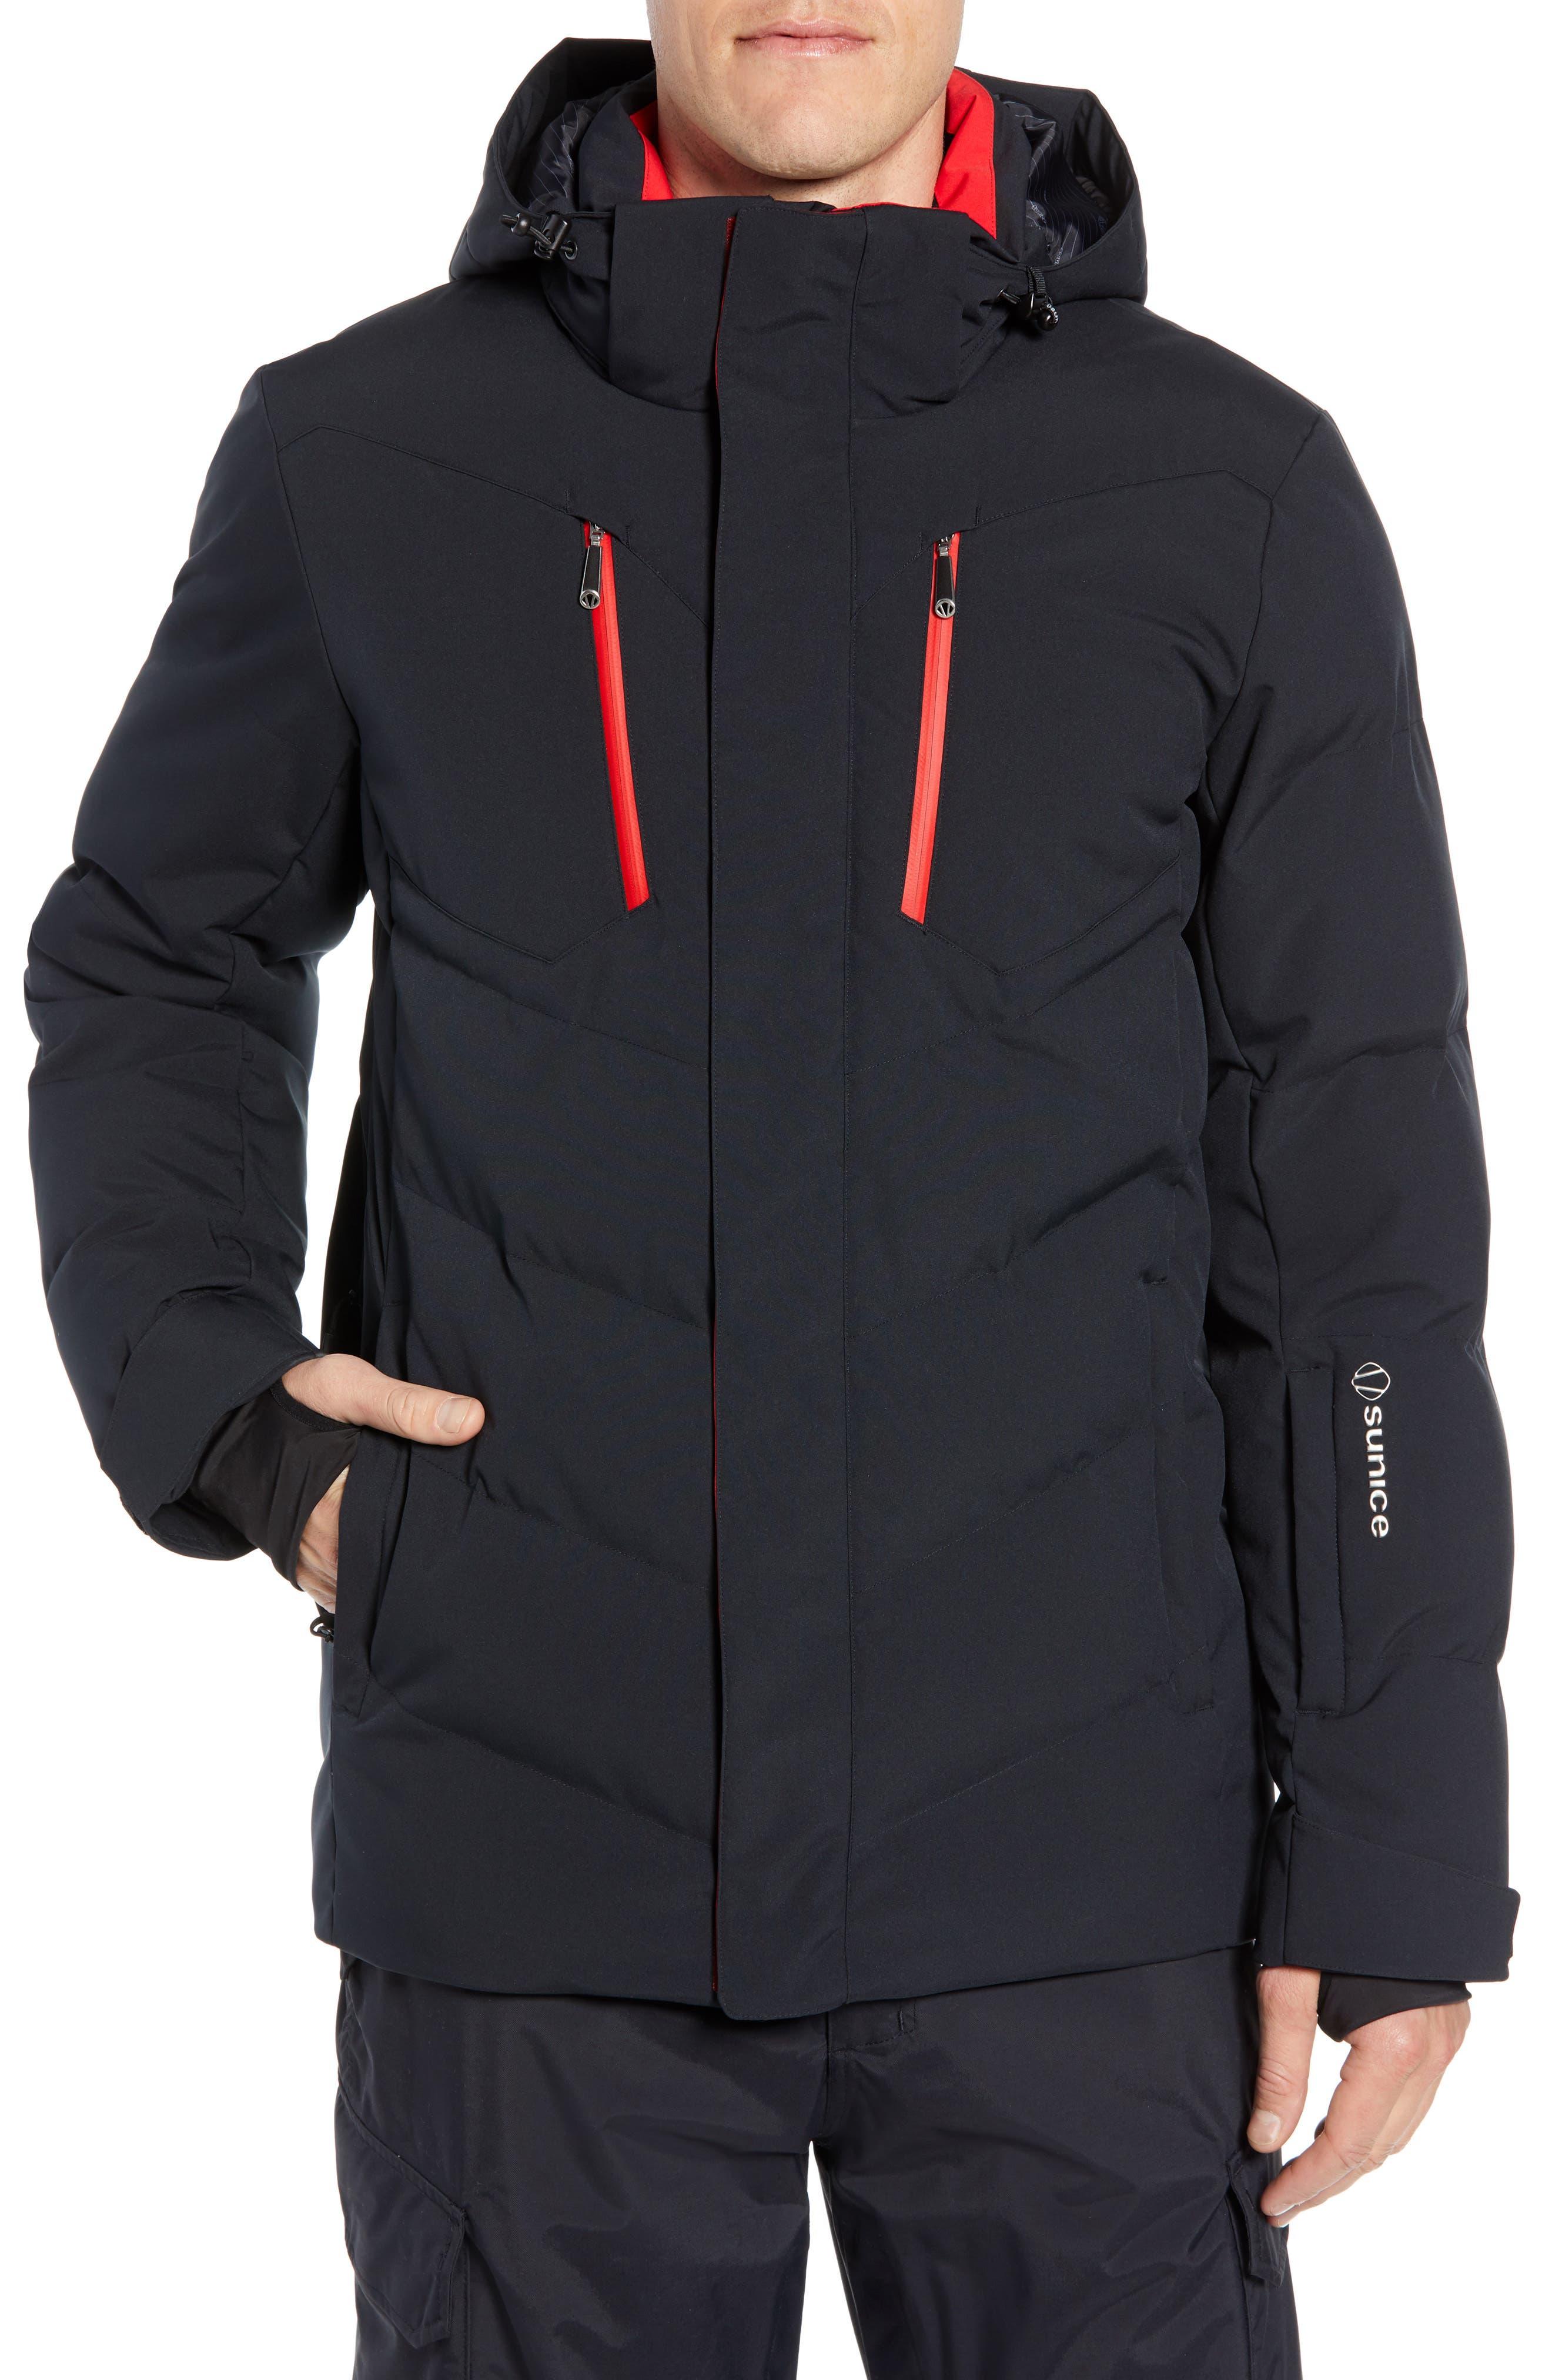 Boulder Waterproof Jacket,                         Main,                         color, 001